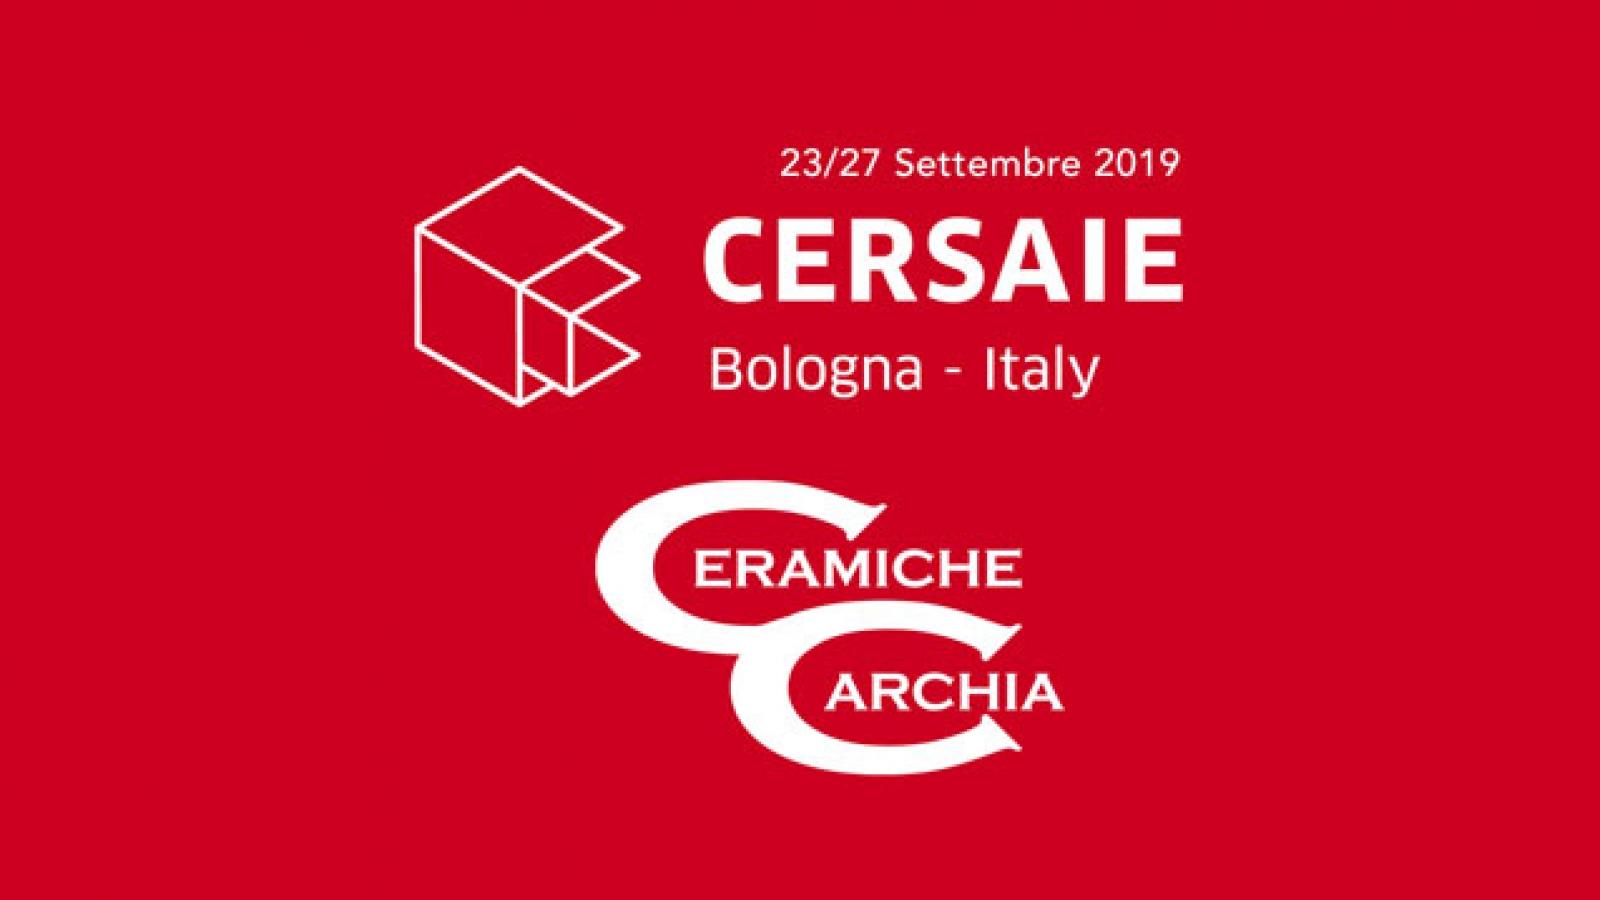 immagine-cersaie-bologna-2019